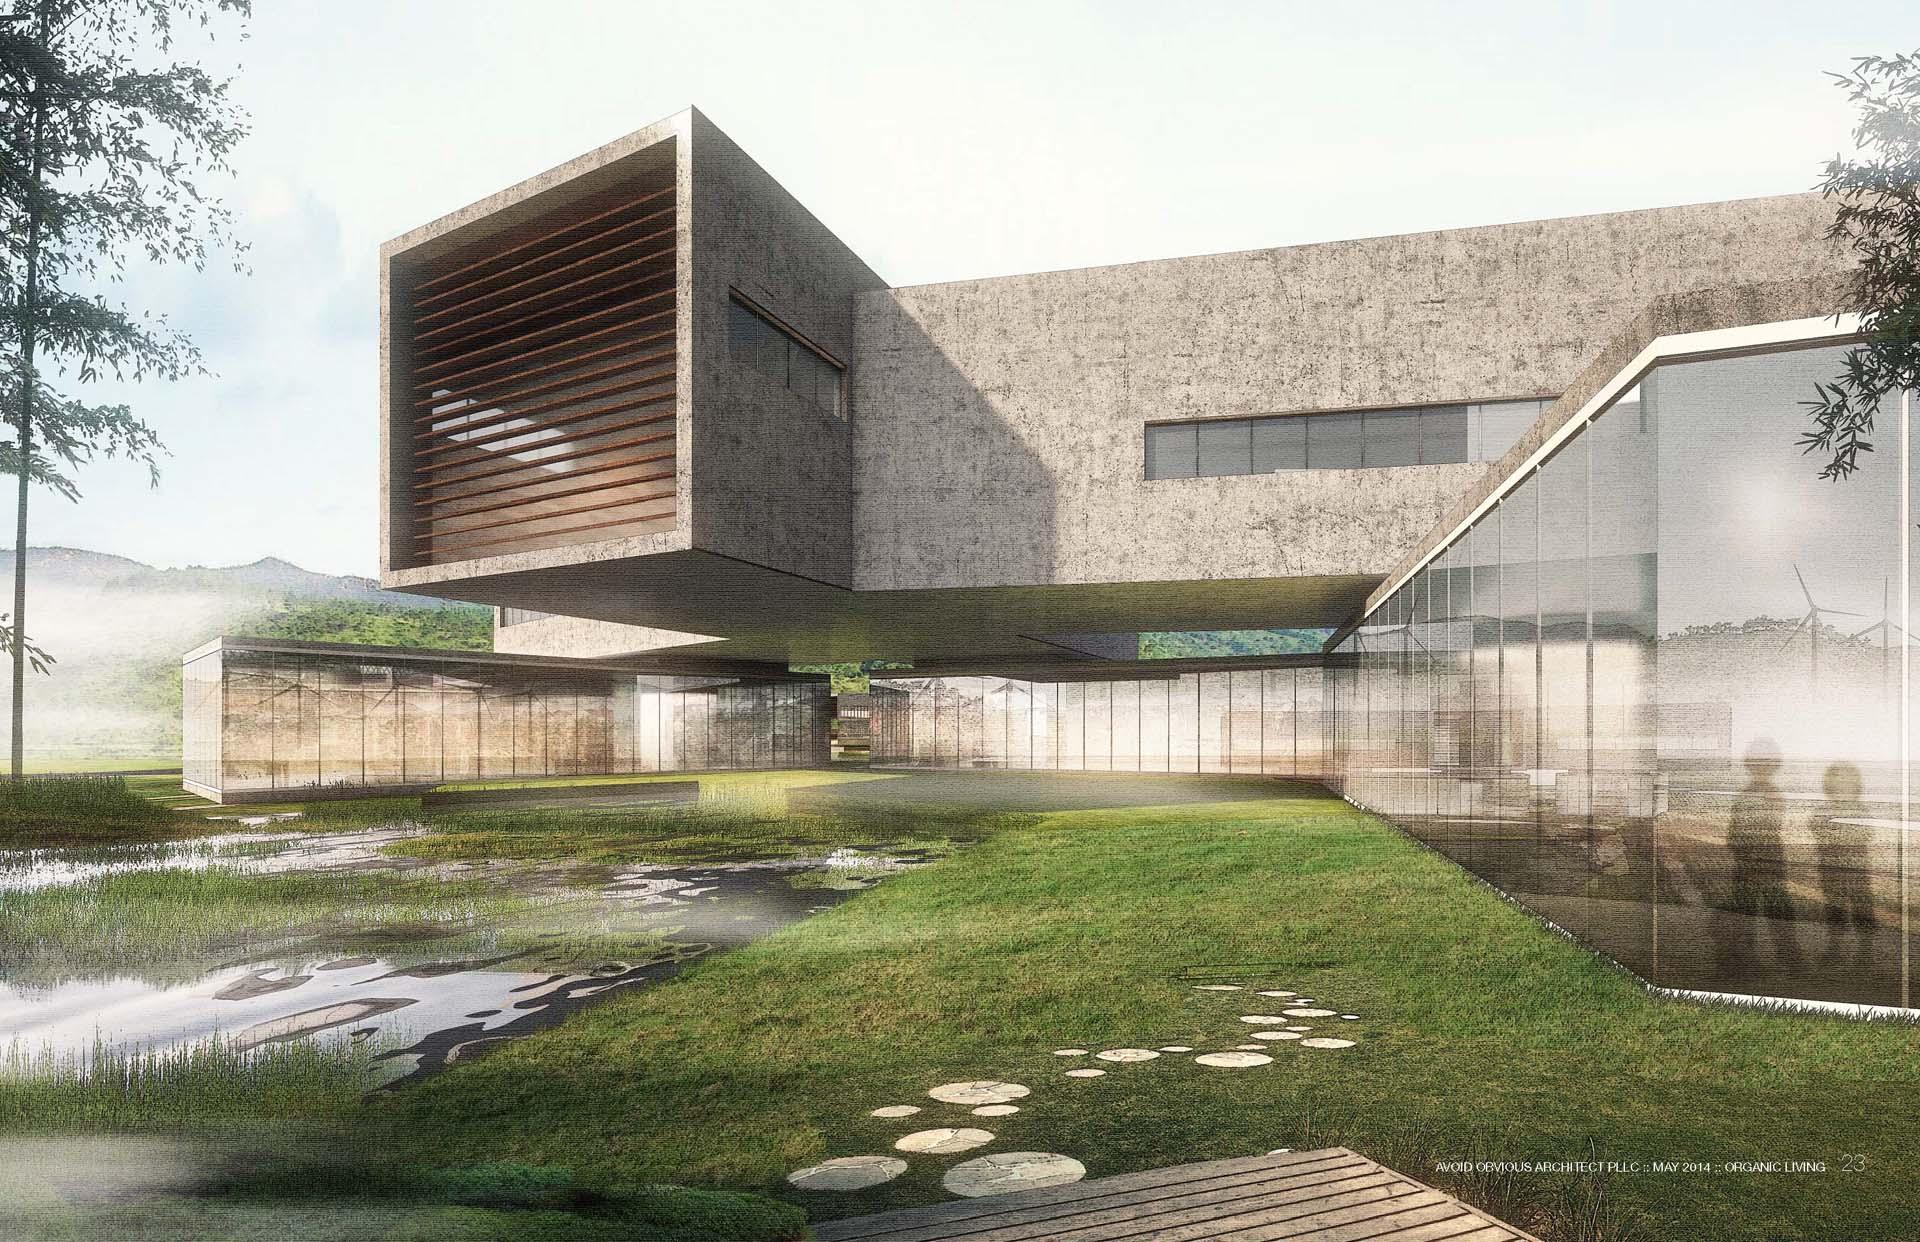 Residential, Villa, organic, architecture, farm, house, green living